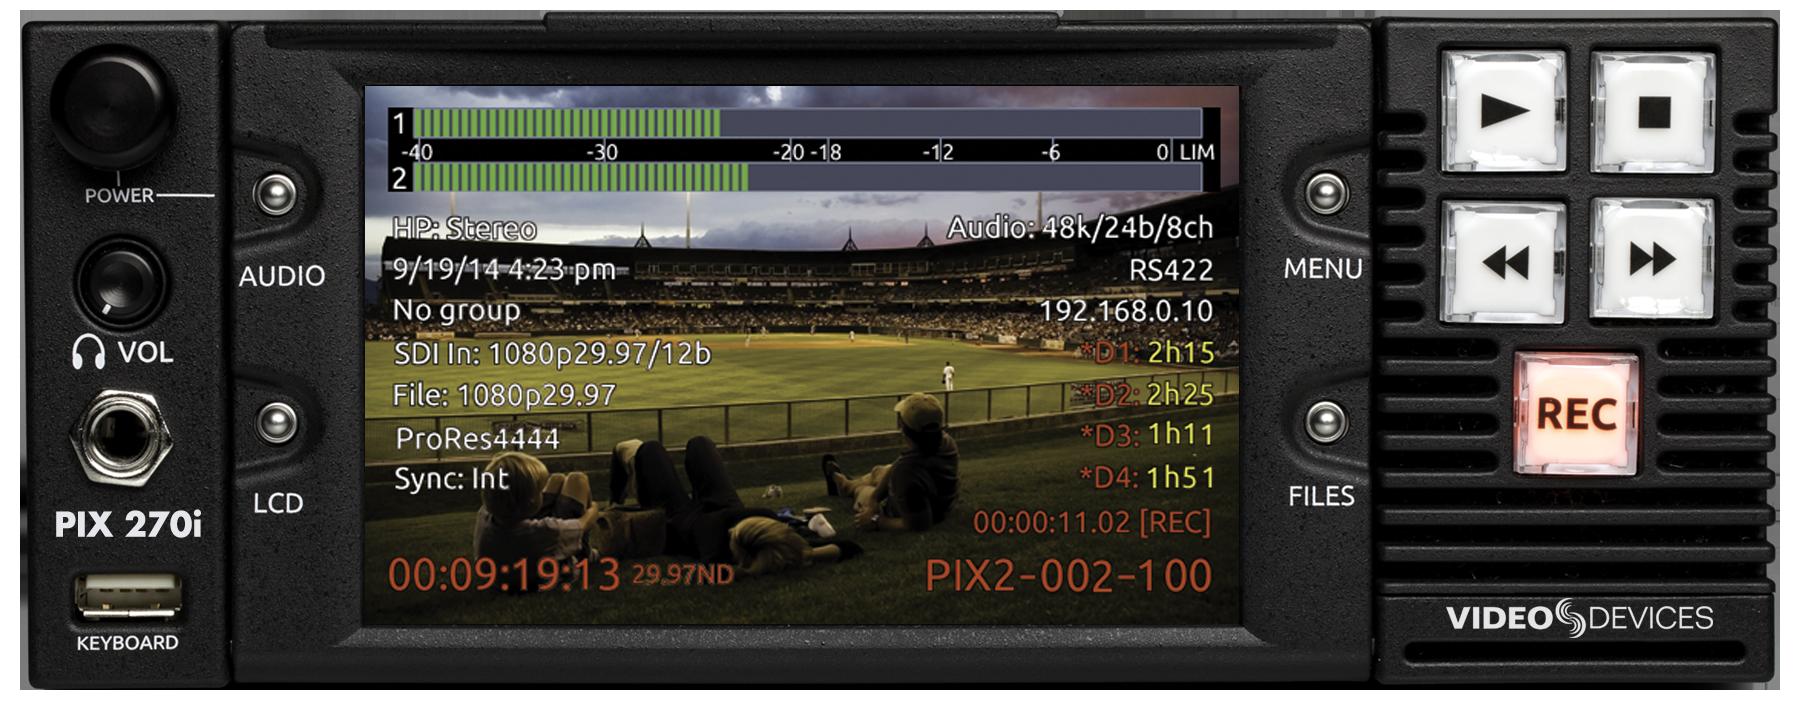 PIX 270i » Sound Devices